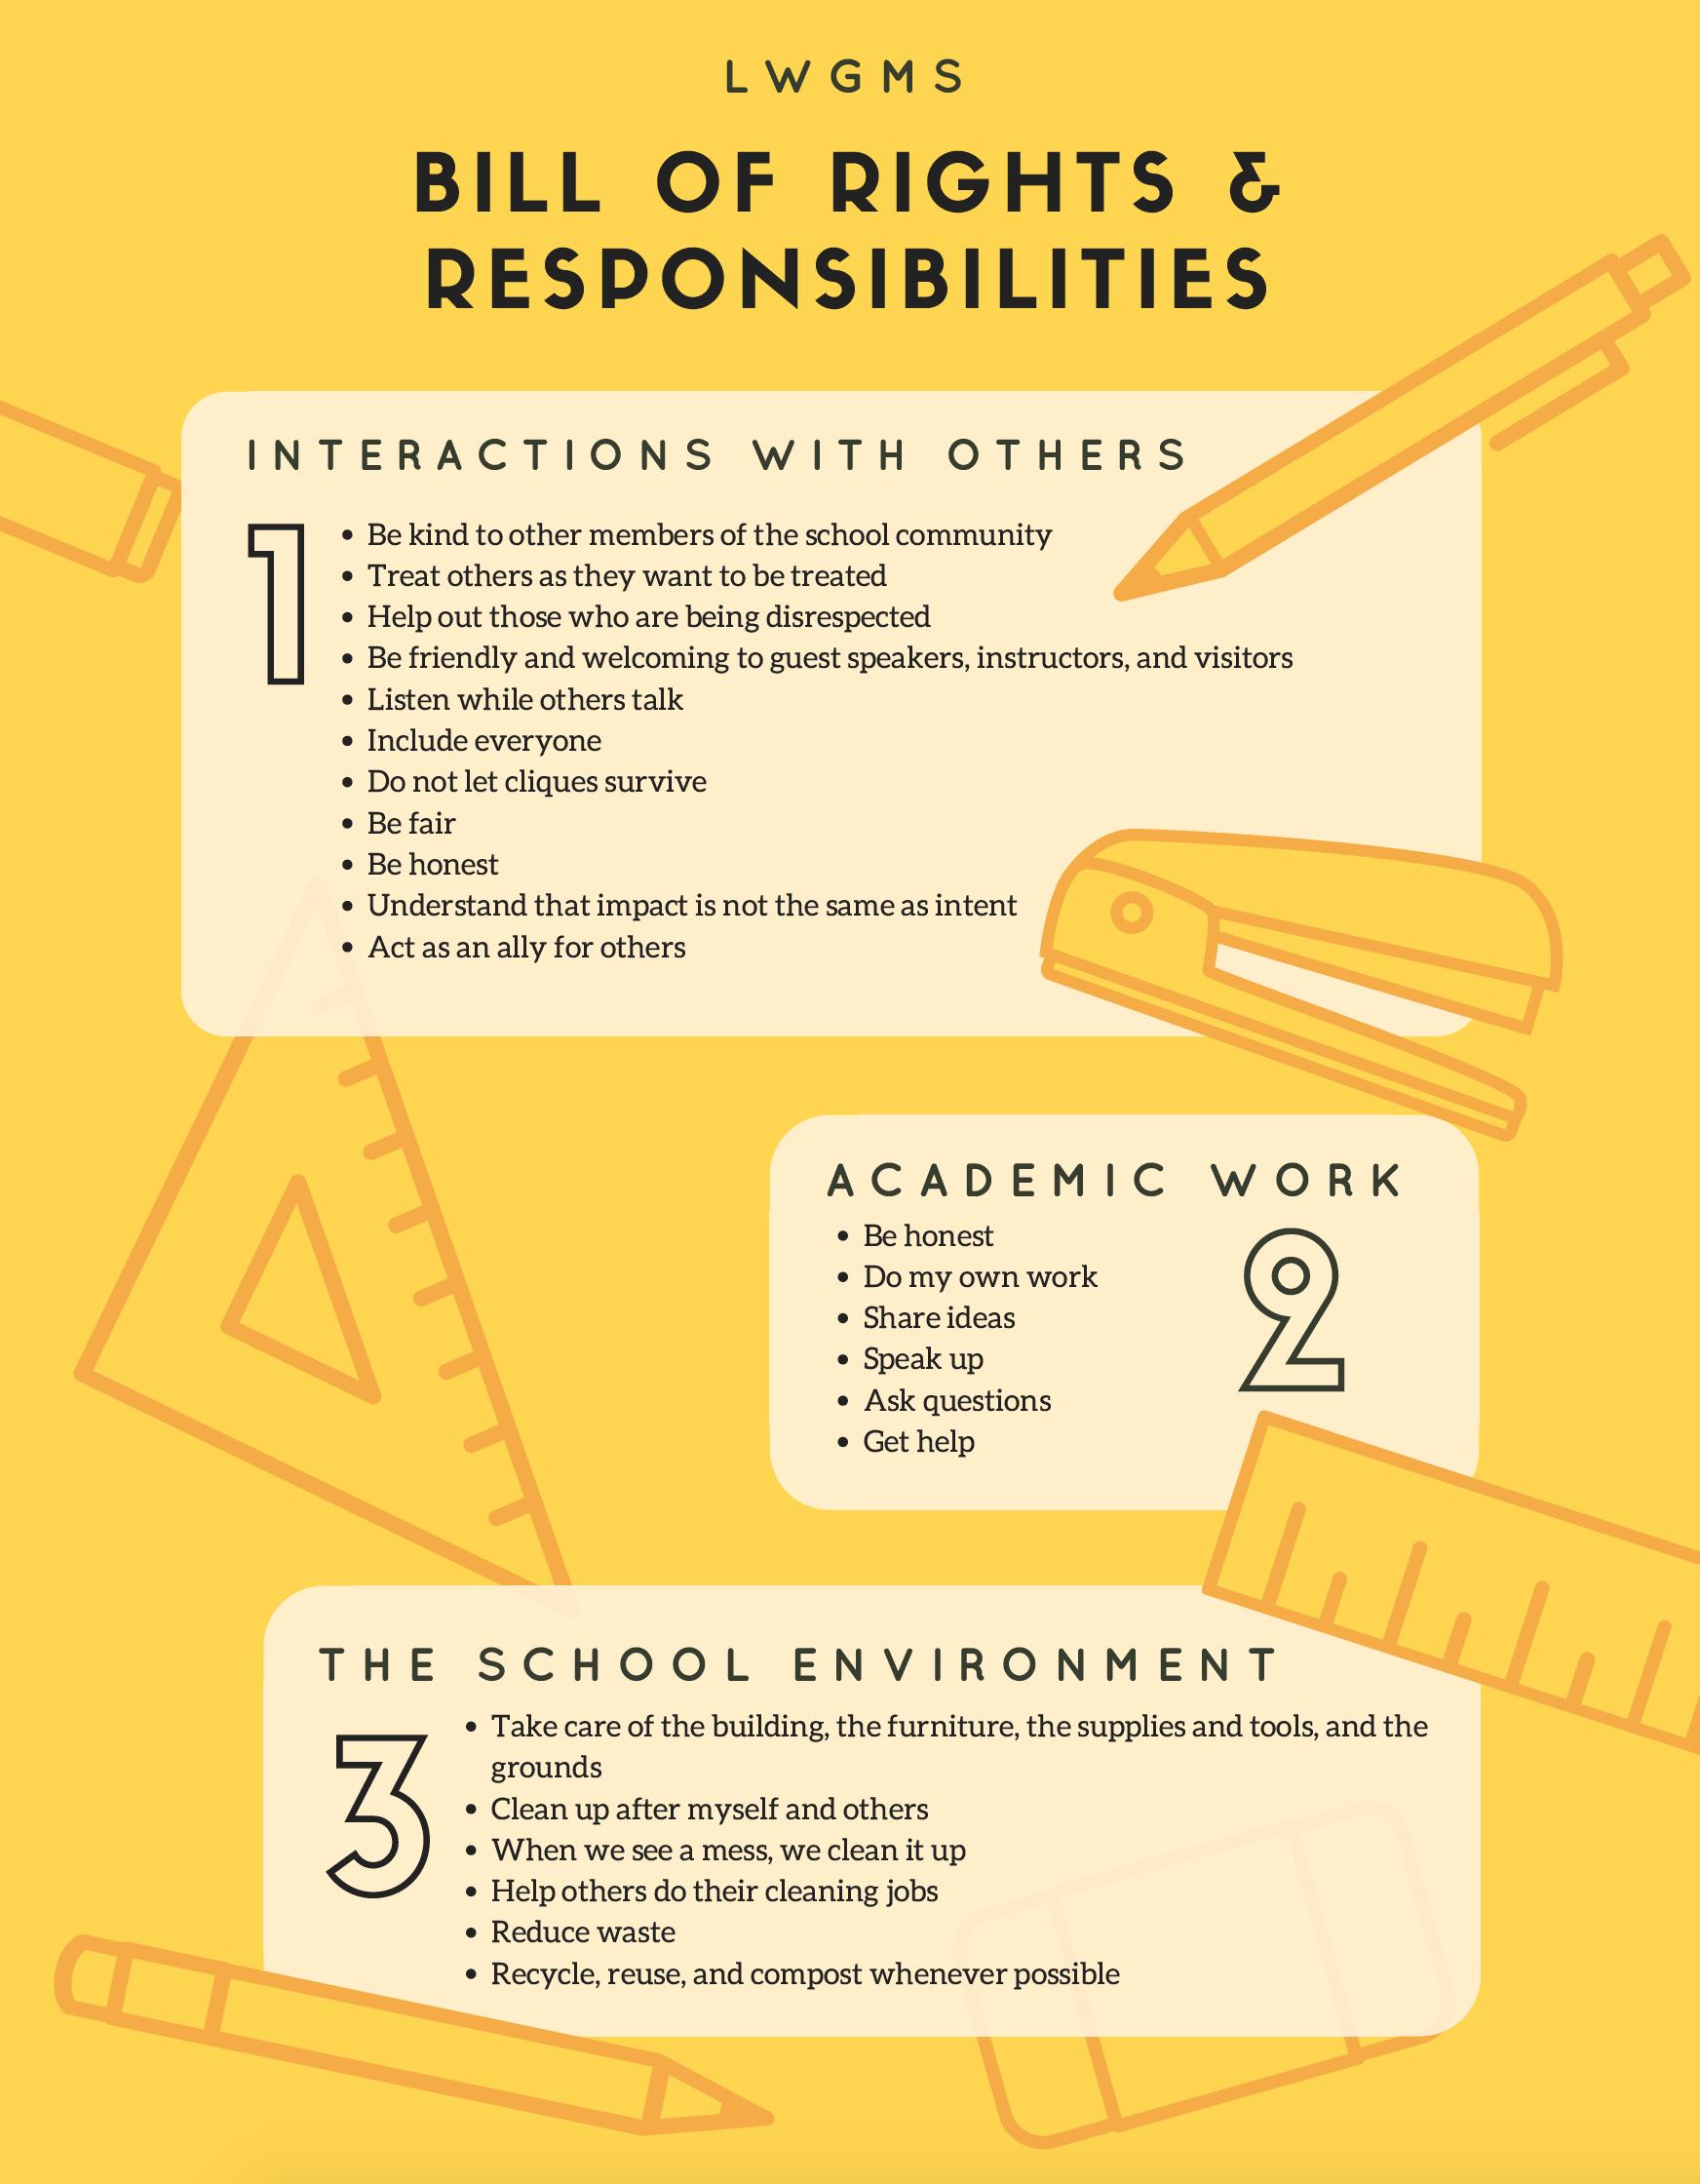 Lake Washington Girls Middle School Bill of Rights and Responsibilties.